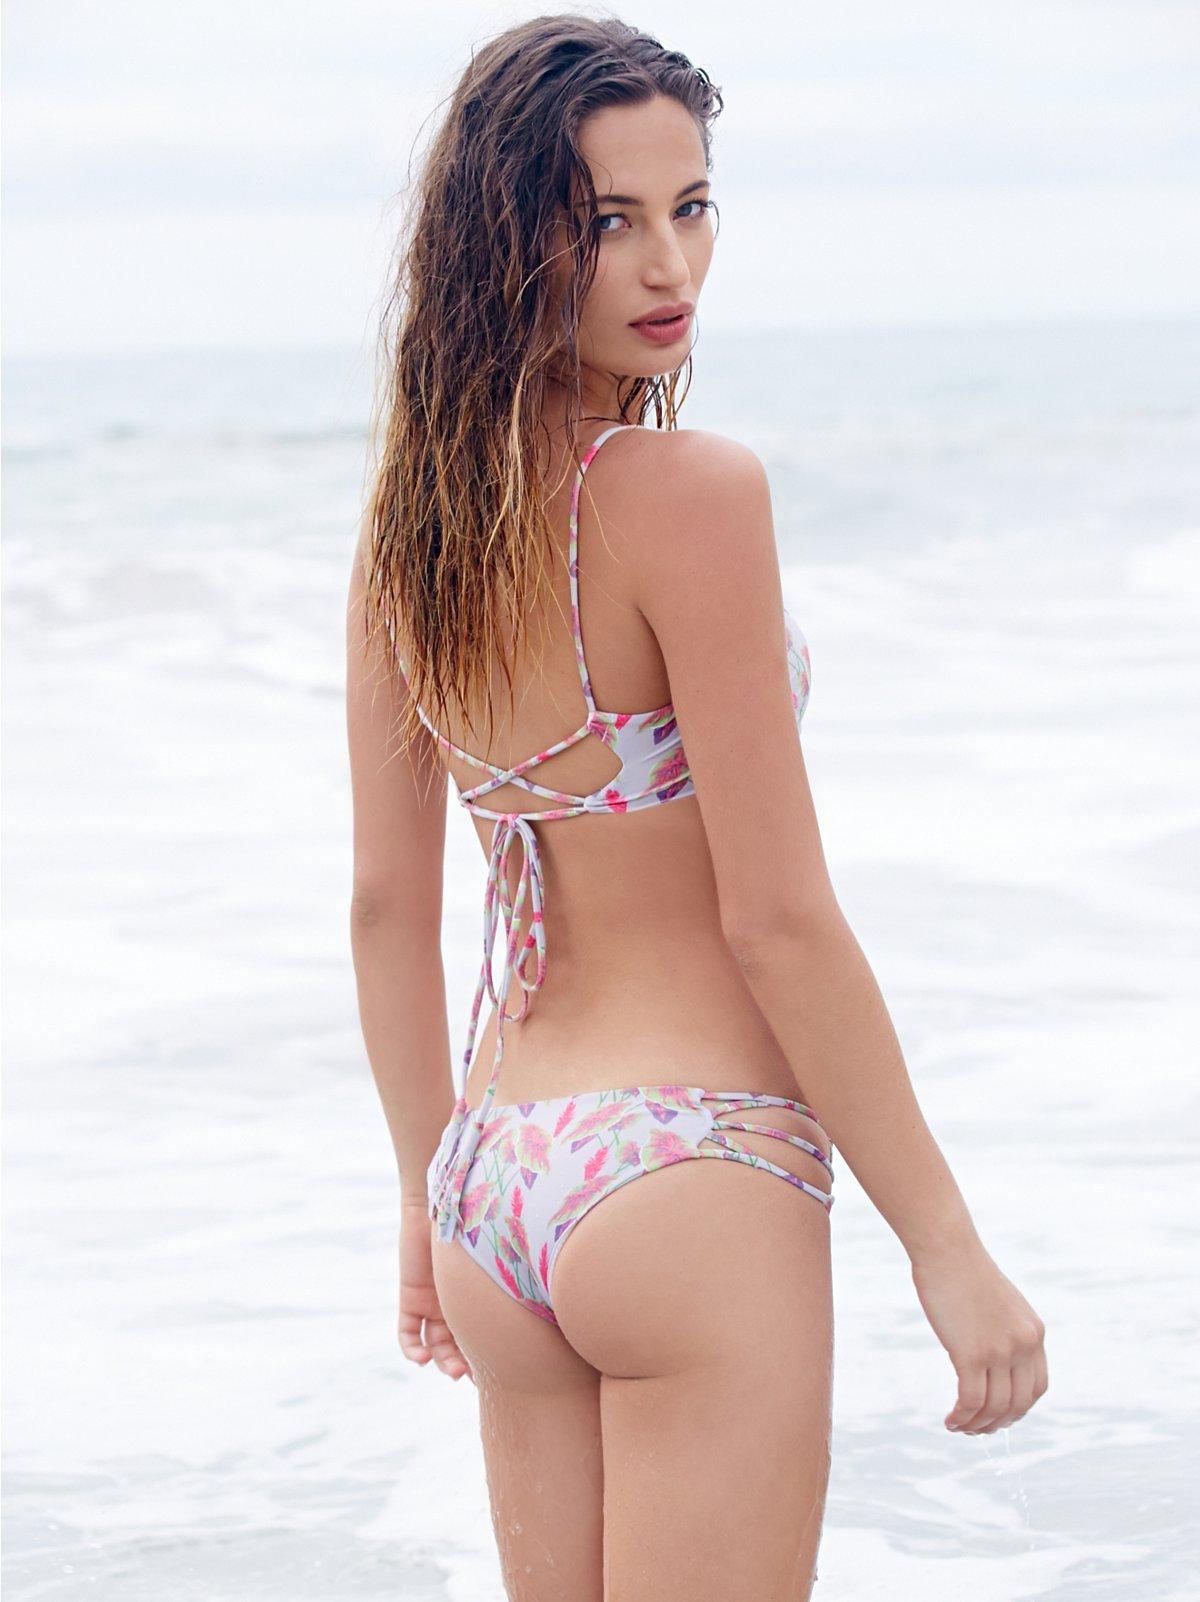 LA Riviera分体泳衣短裤